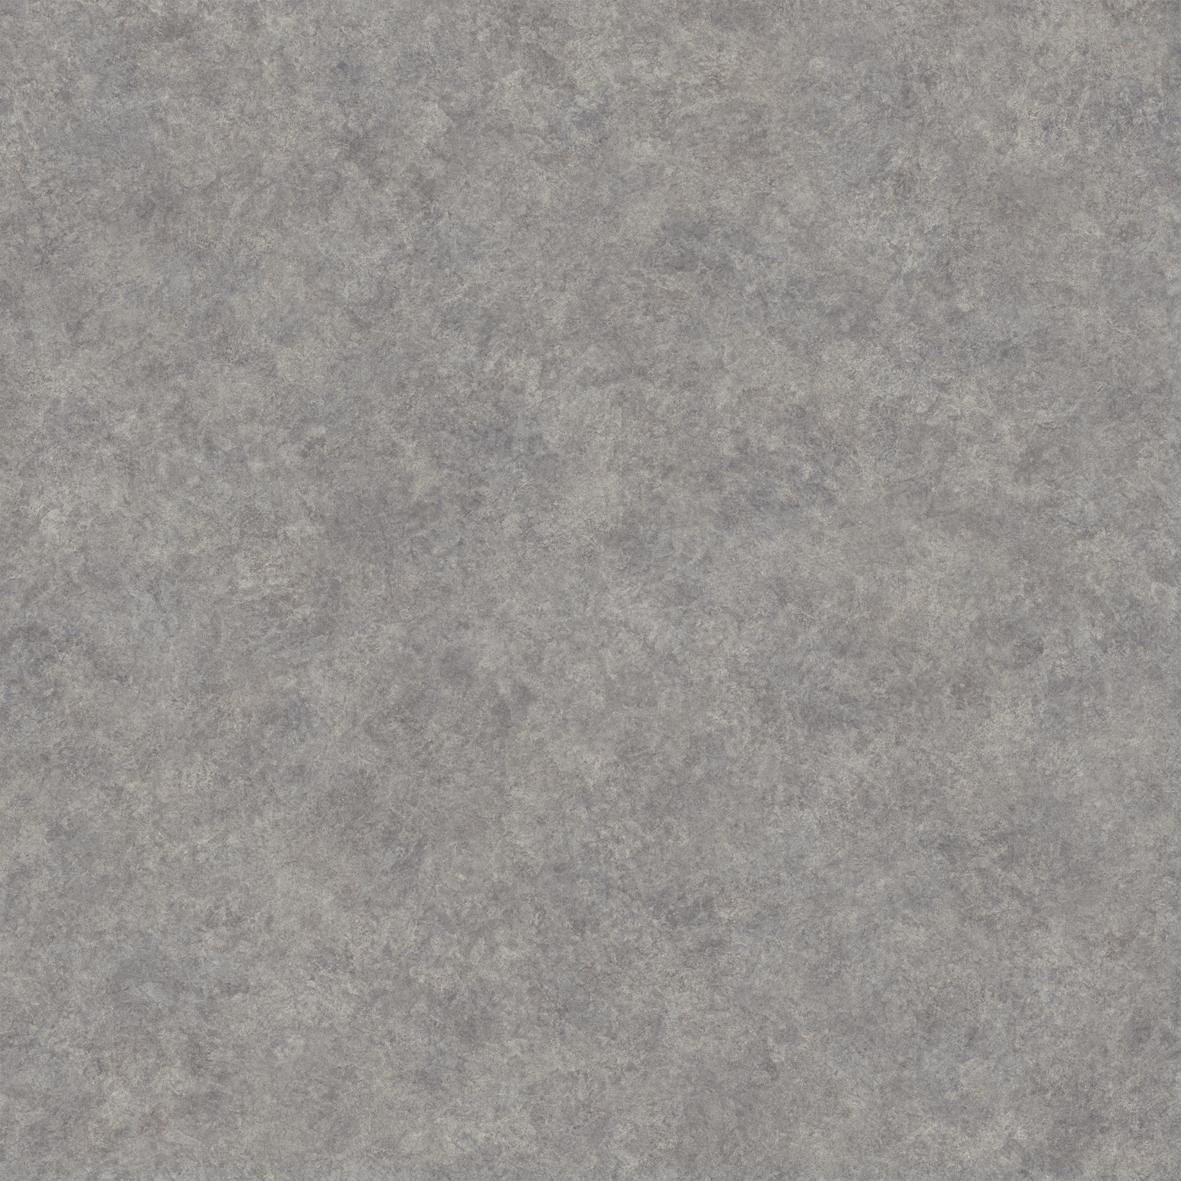 pvc boden rot pvc boden rot atemberaubend linoleum bodenbelag farbe rot pvc boden rot. Black Bedroom Furniture Sets. Home Design Ideas